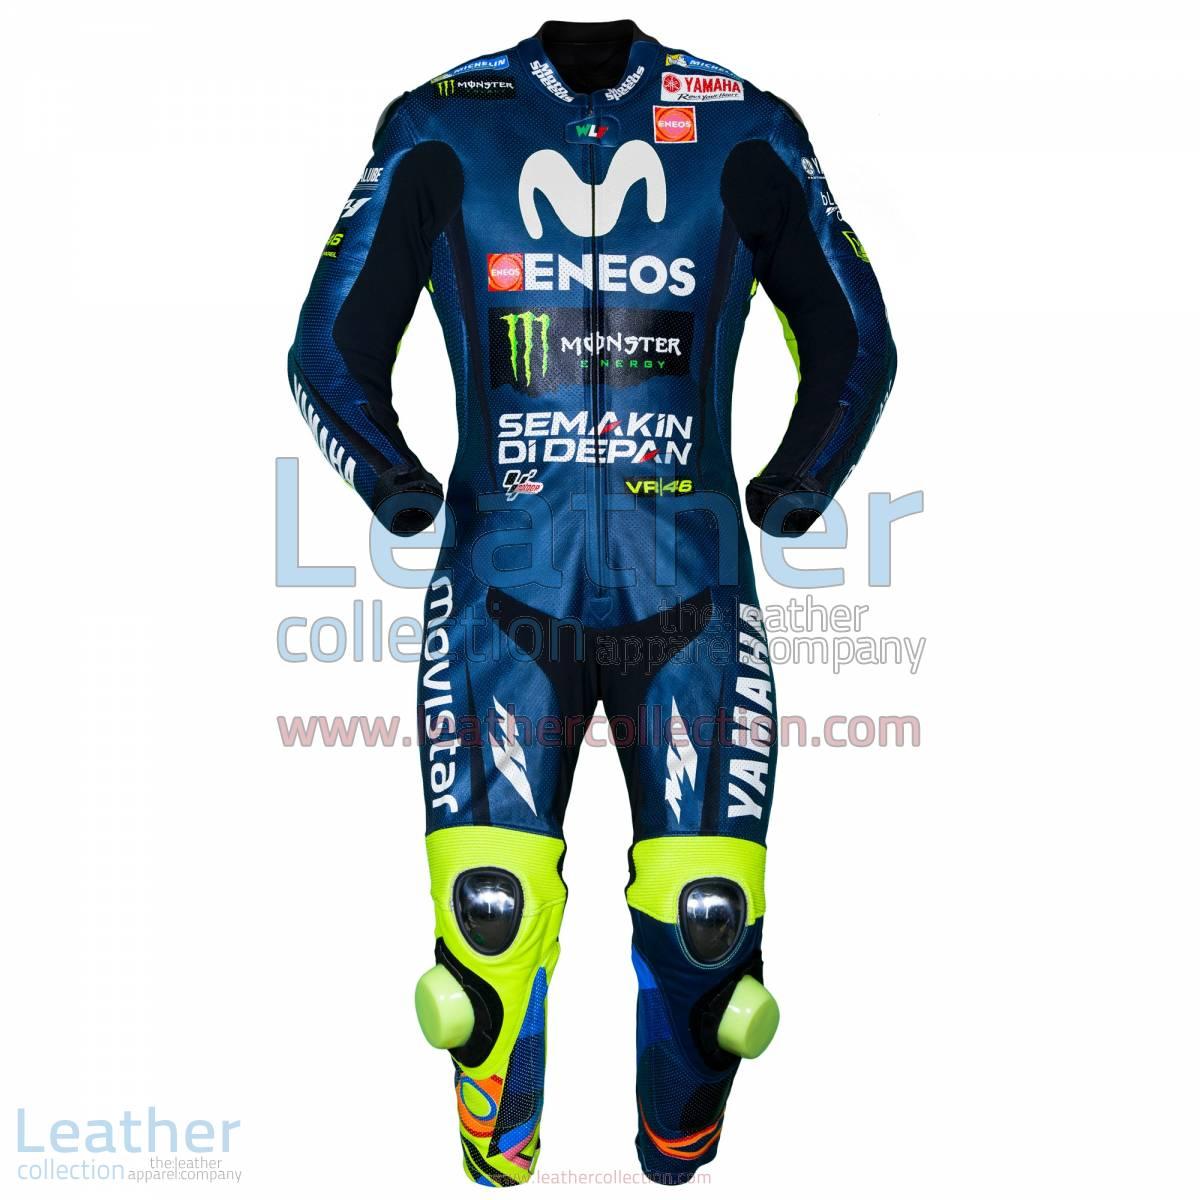 Valentino Rossi Movistar Yamaha MotoGP 2018 Race Suit | Valentino Rossi Movistar Yamaha MotoGP 2018 Race Suit